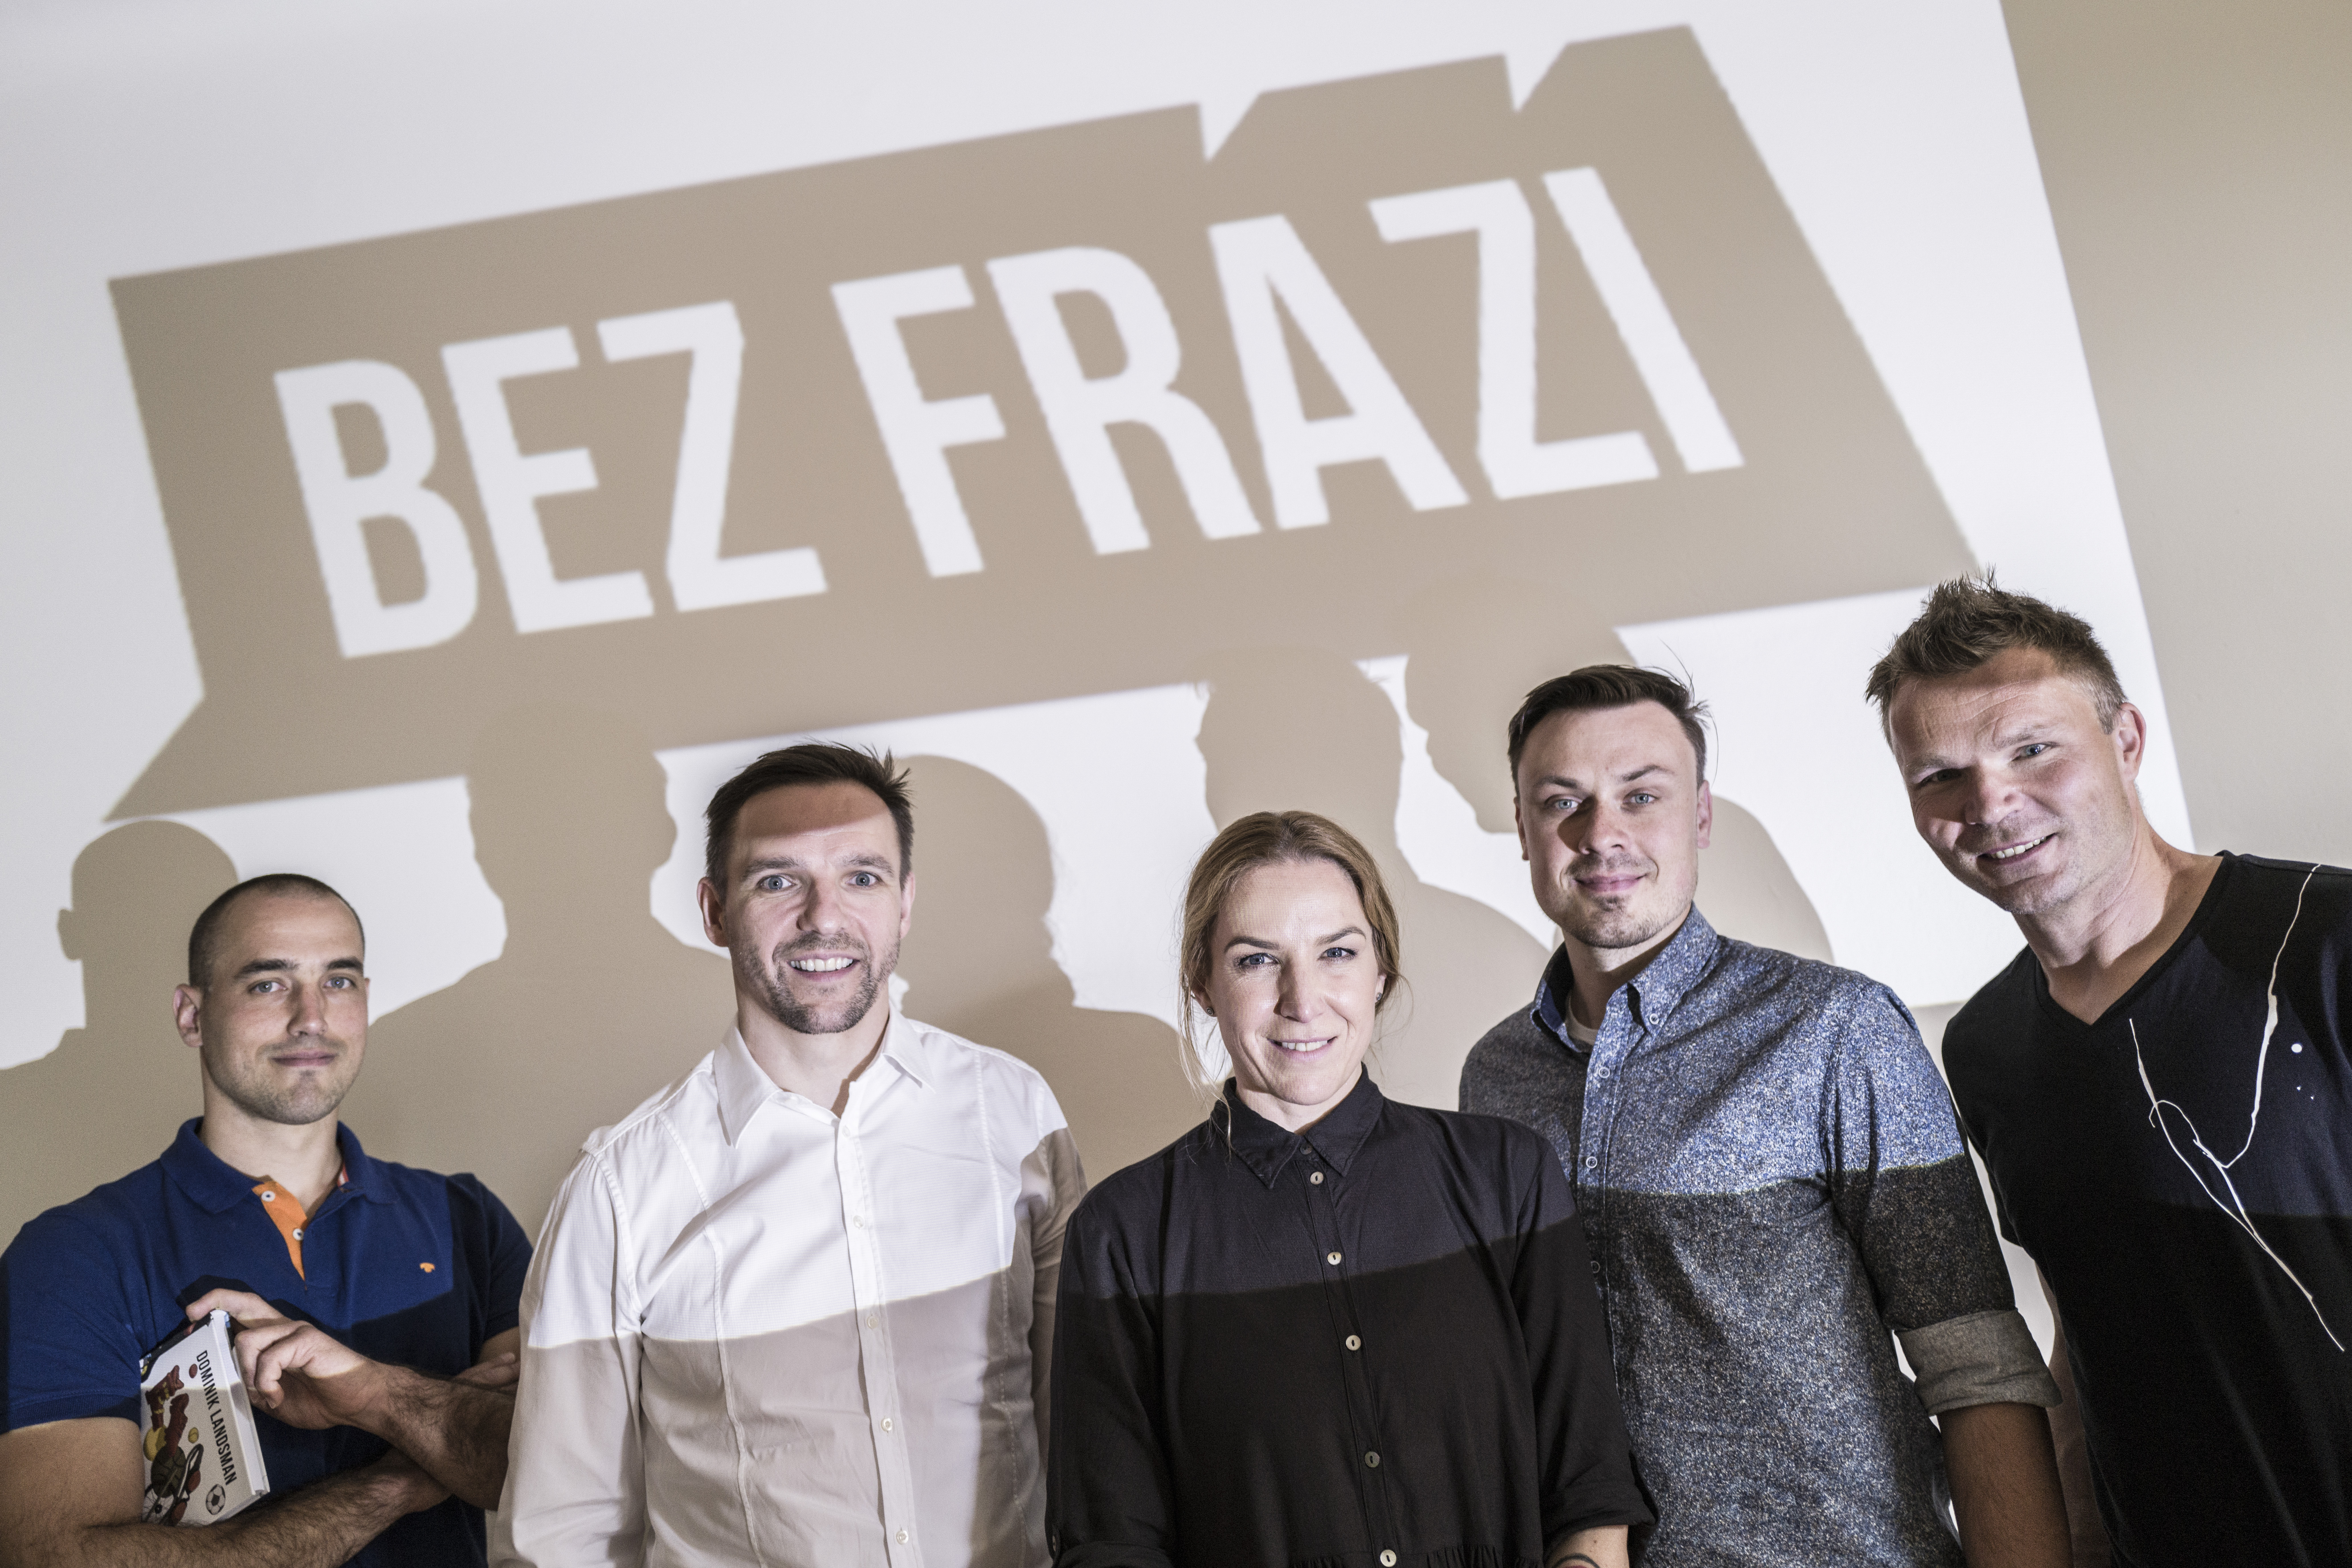 Hlavní osobnosti projektu Bez frází: František Prachař, Radim Vrbata, Jana Mansatorová, František Suchan a Karel Nocar